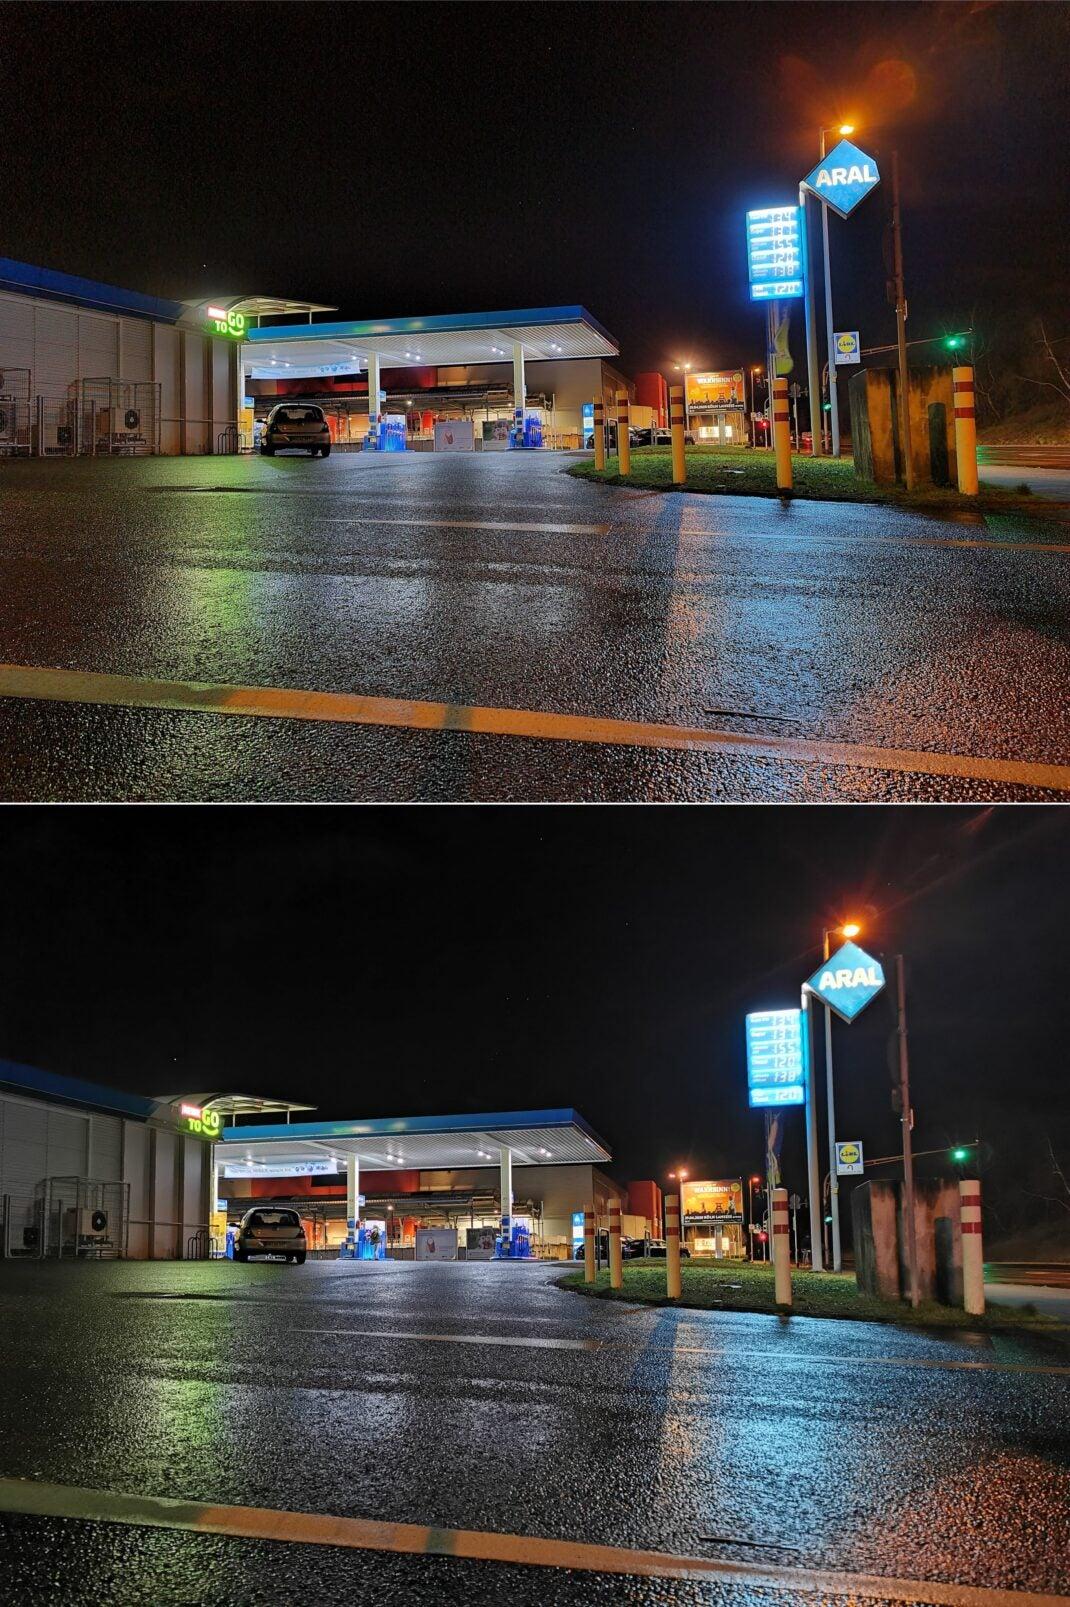 Foto bei Nacht: Oben Samsung Galaxy S20 Ultra, unten Huawei P30 Pro